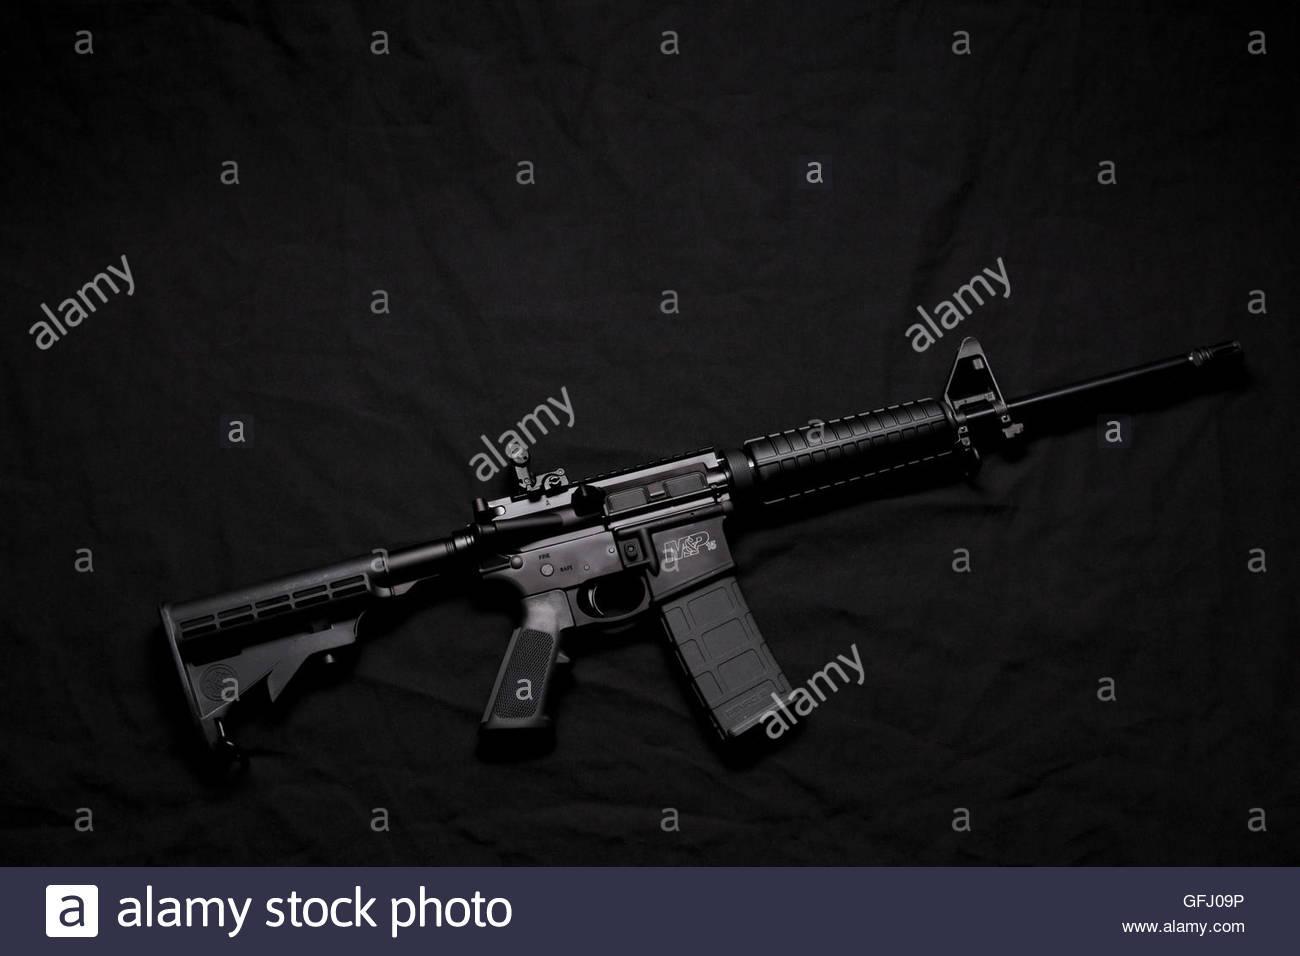 Smith & Wesson M&P 15 Sport II Stock Configuration Stock Photo ...